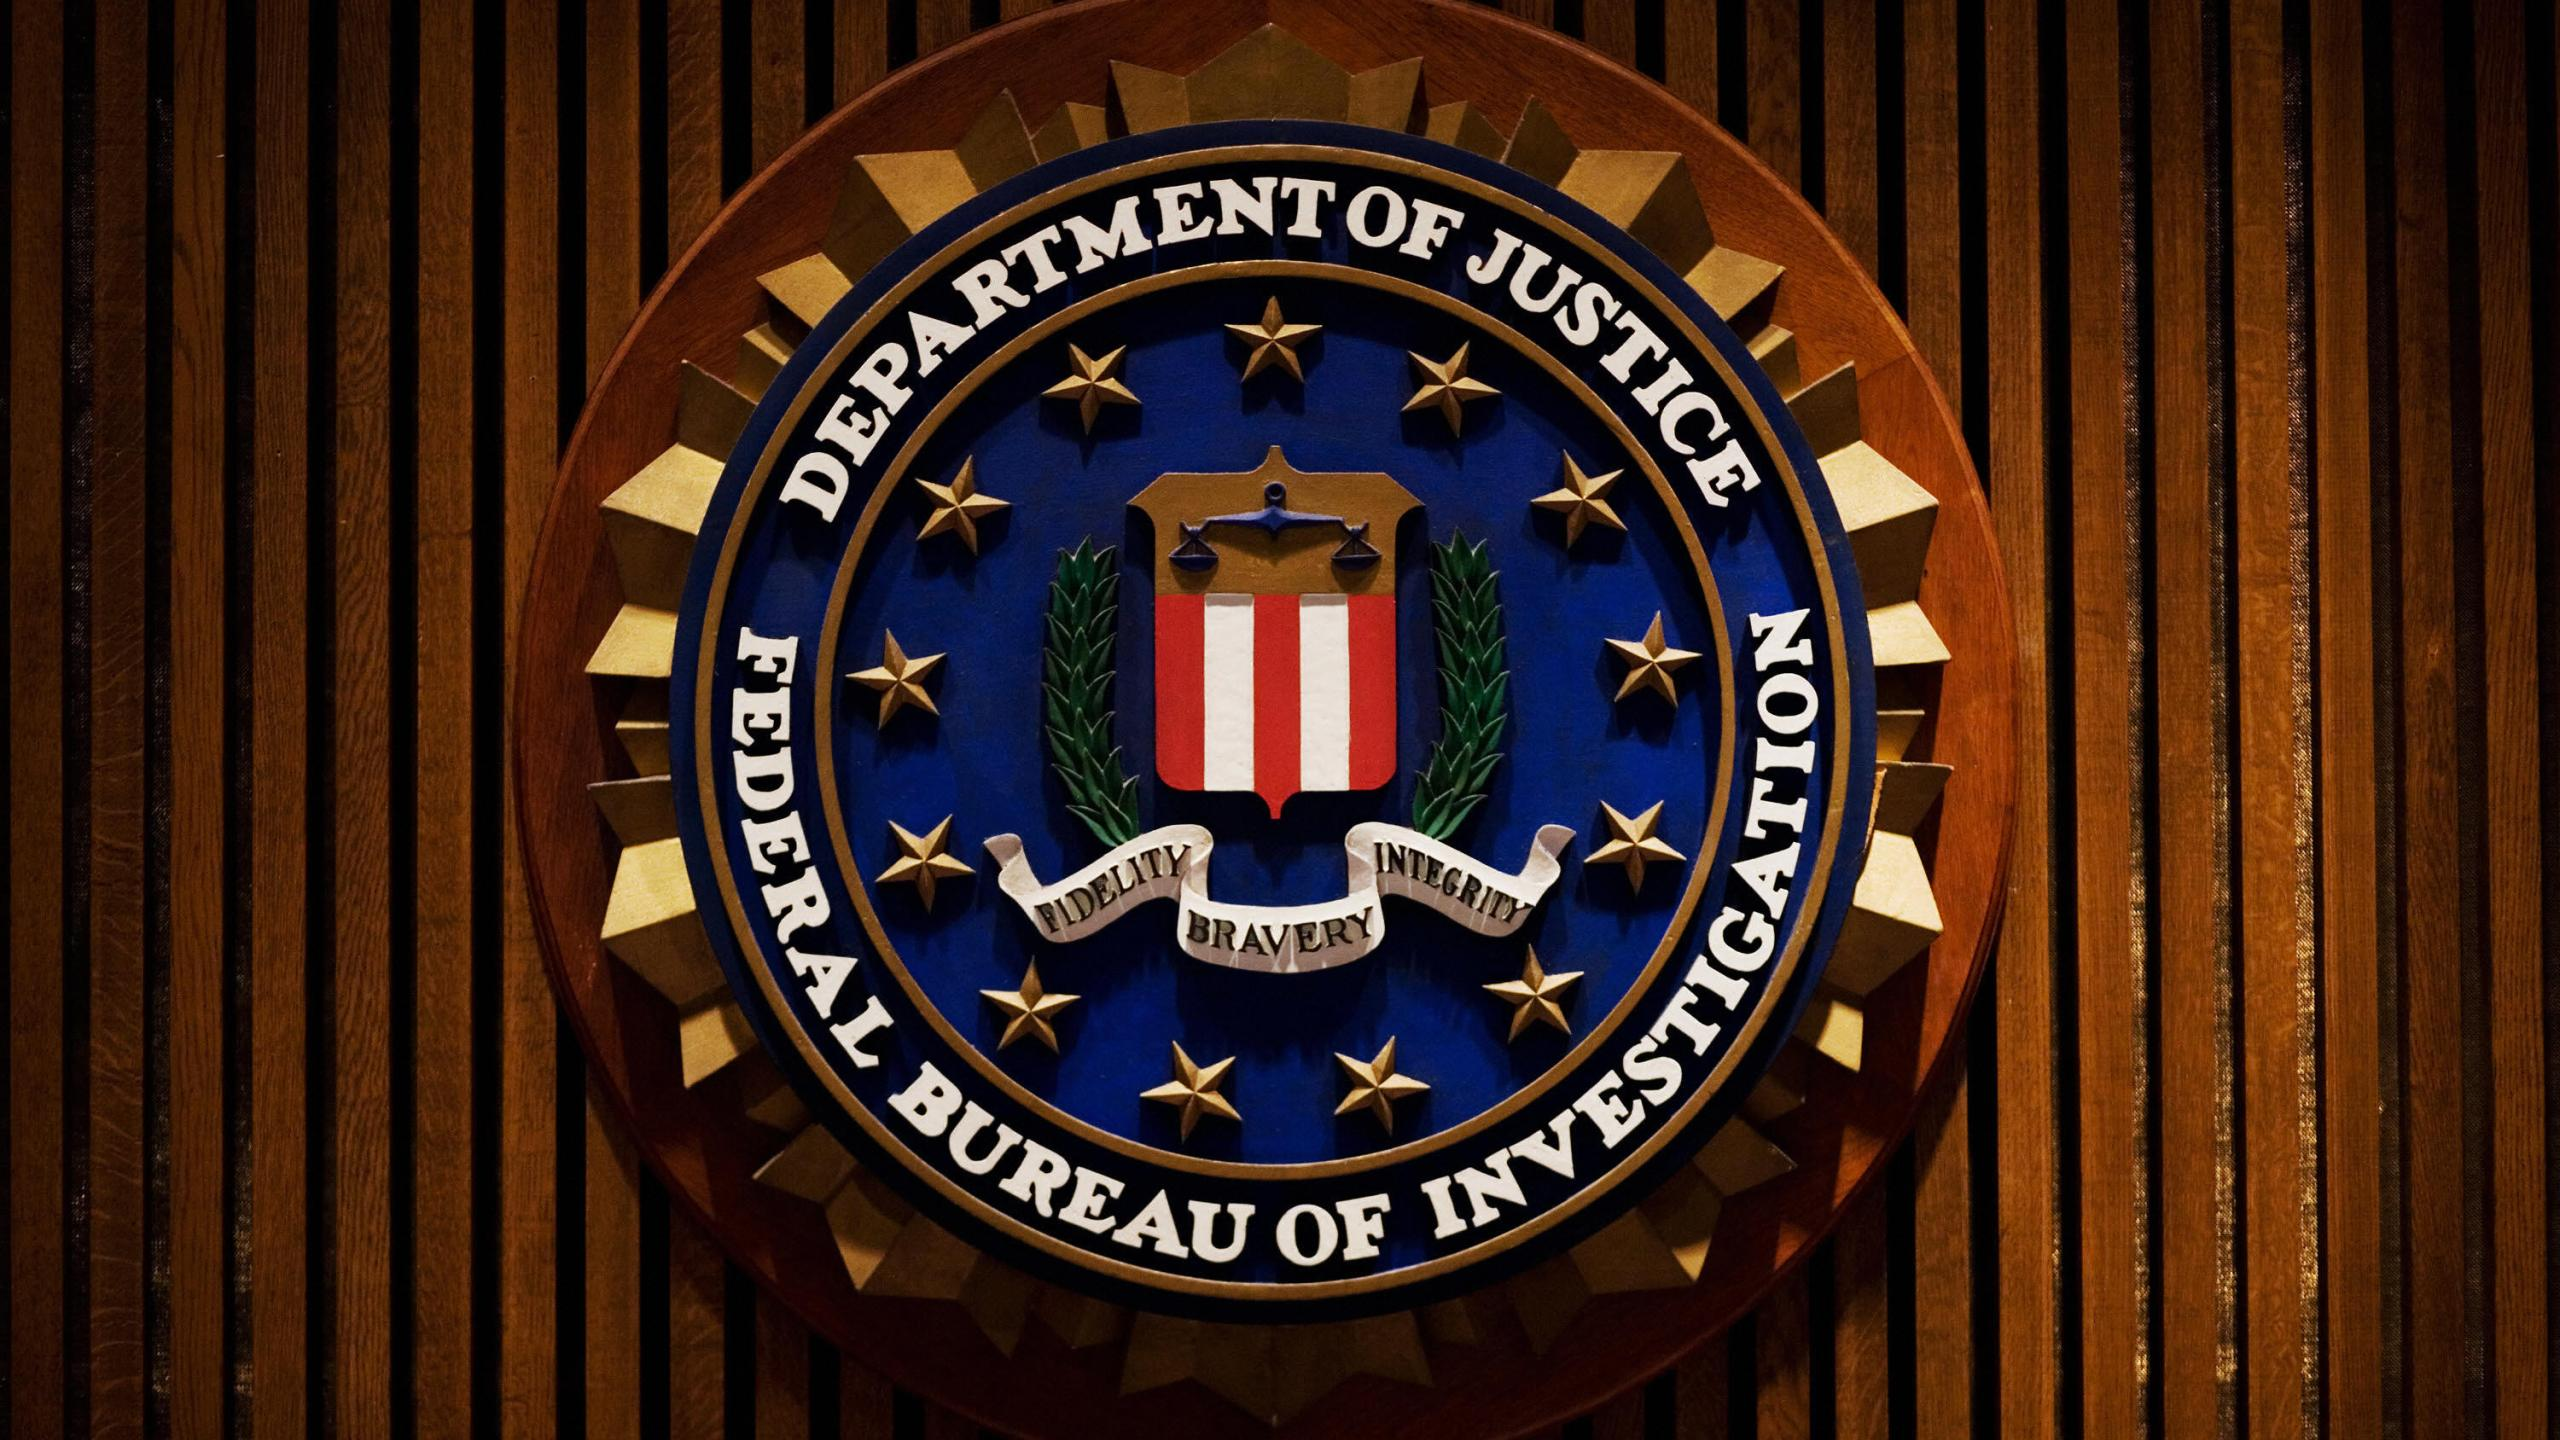 A crest of the Federal Bureau of Investigation is seen 03 August 2007 inside the J. Edgar Hoover FBI Building in Washington, DC. AFP PHOTO/Mandel NGAN (Credit: MANDEL NGAN/AFP/Getty Images)